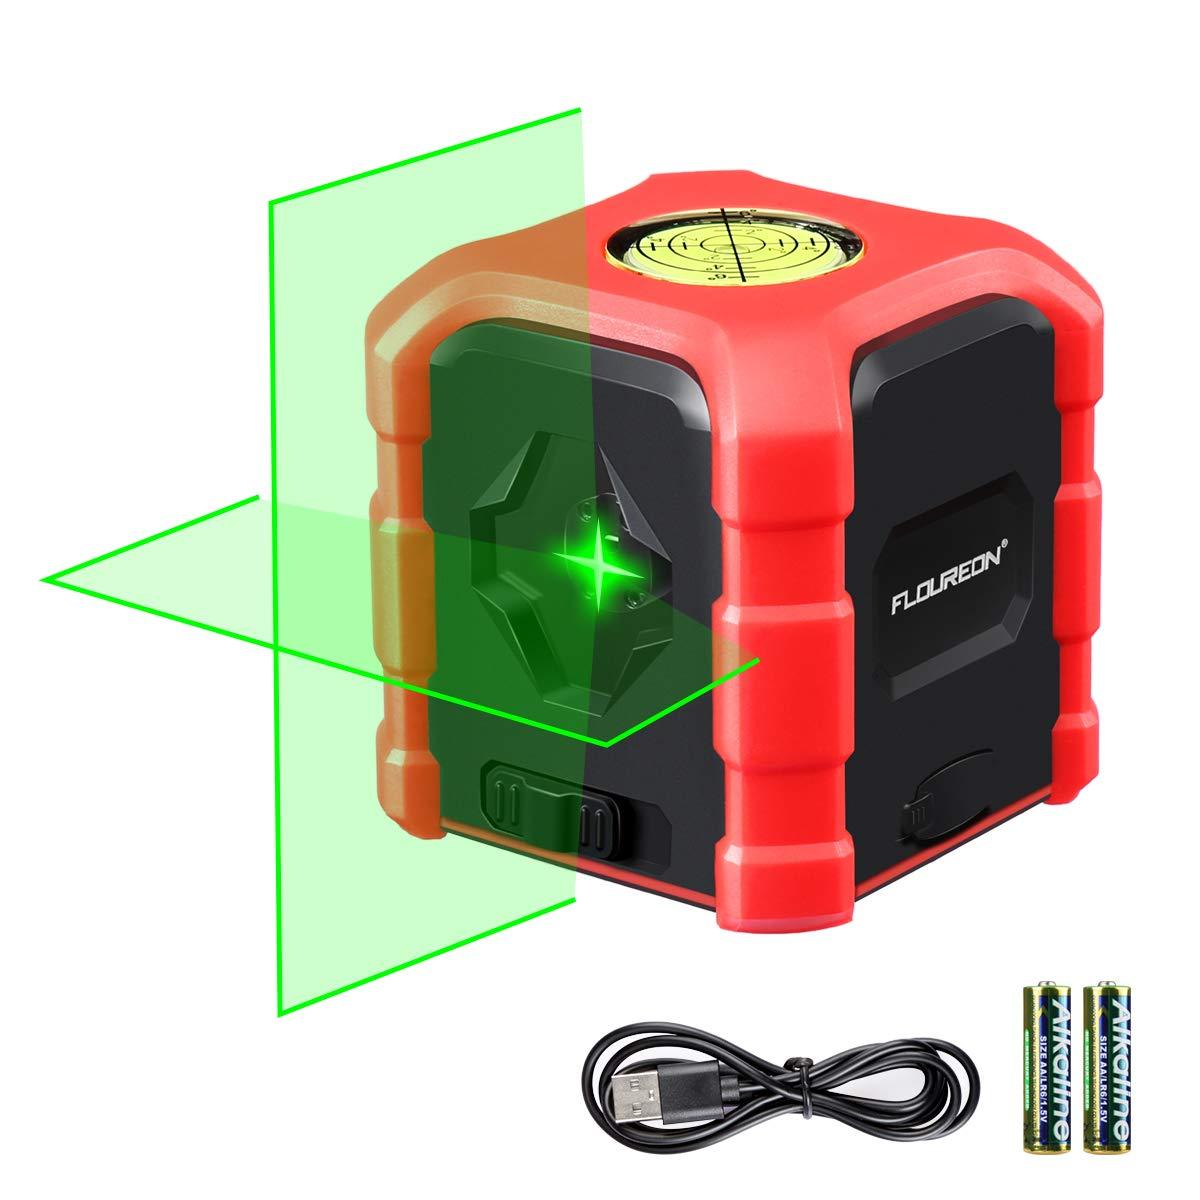 FLOUREON Laser Level Self-Leveling Horizontal and Vertical Cross-Line Laser, Tripod Mount Base, IP54 Waterproof, Dustproof, Shockproof, Dual Ways to Charge(batterries included) ...